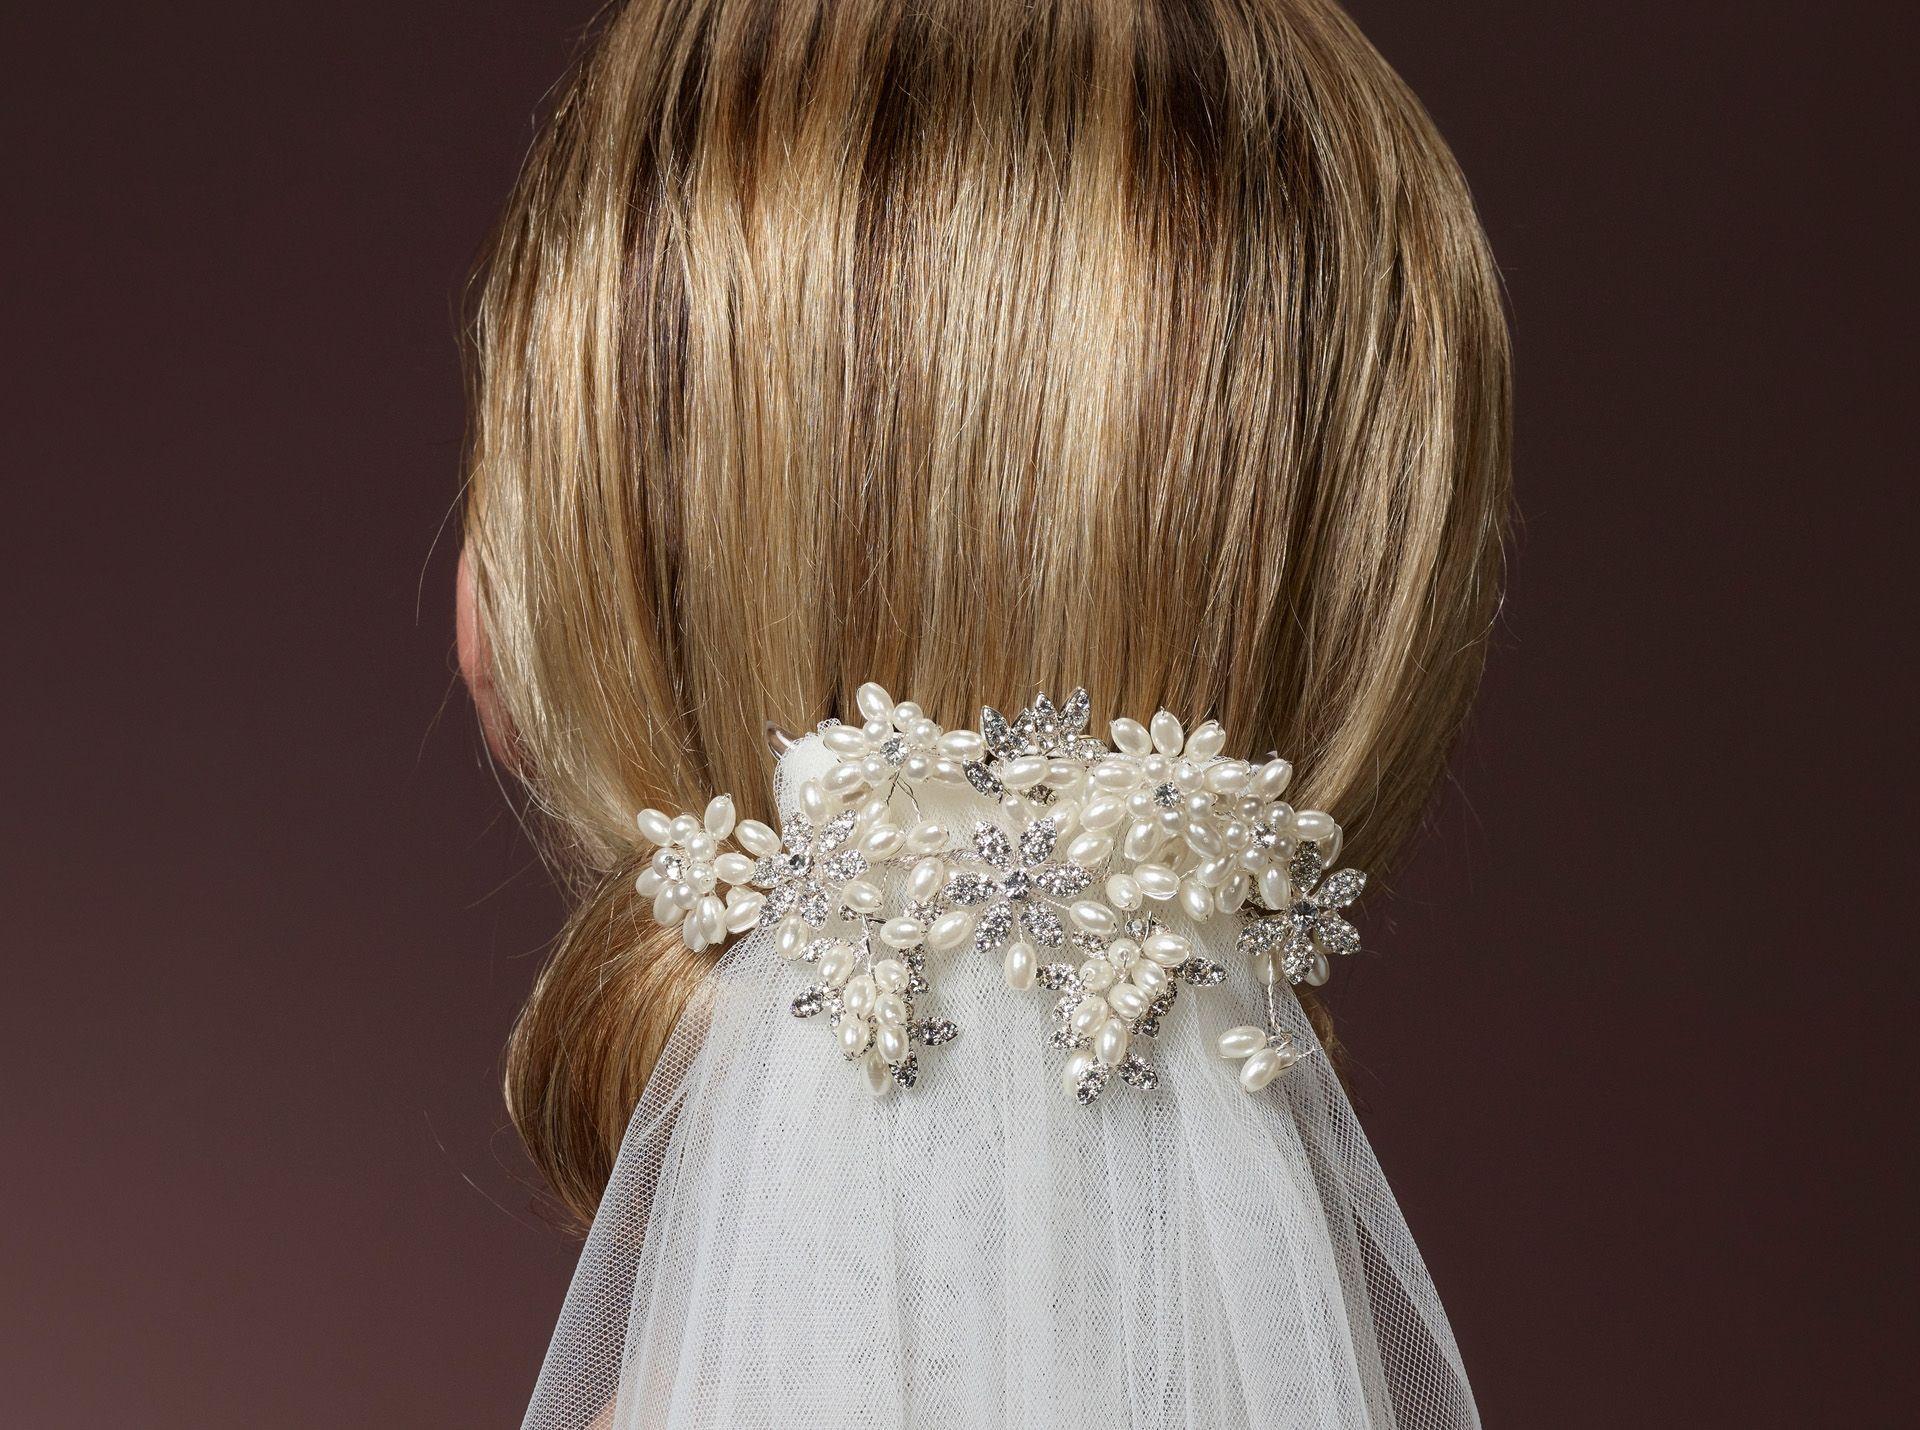 Prachtige Accessoire Voor Op Je Sluier Poirier Kapsel Bruid Bruidskapsel Sluier